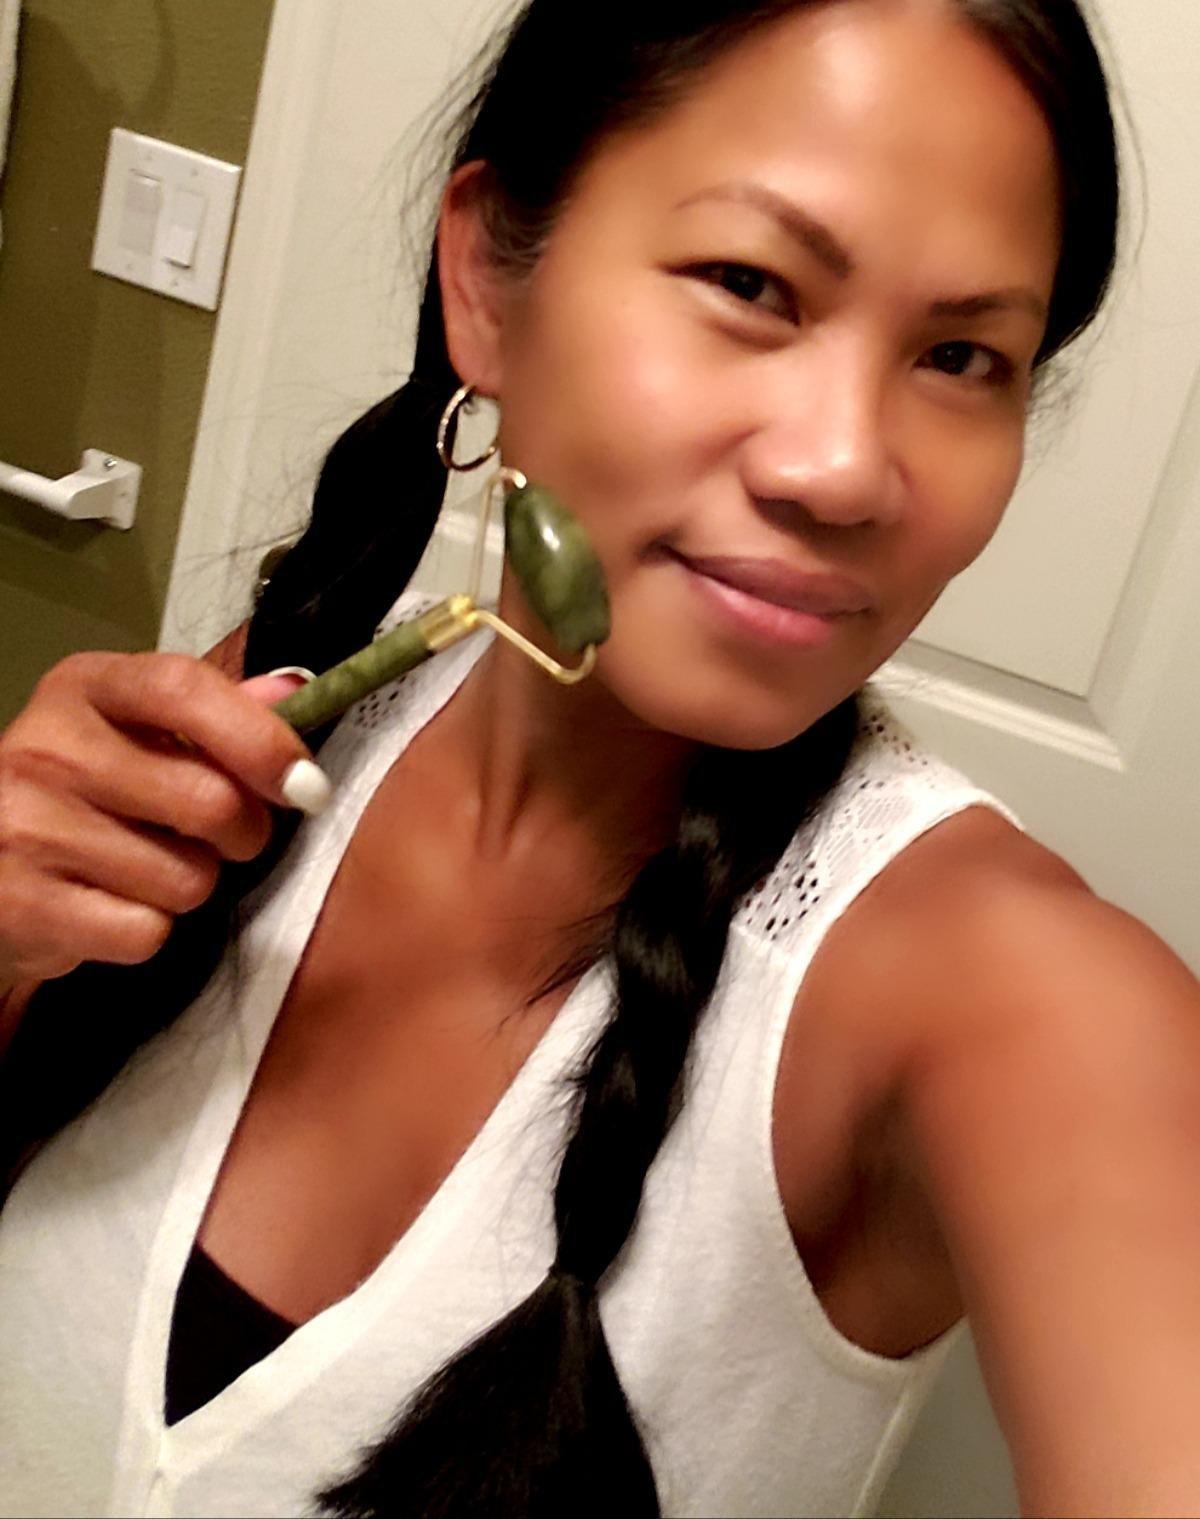 Reviewer uses dark green jade roller on their cheek